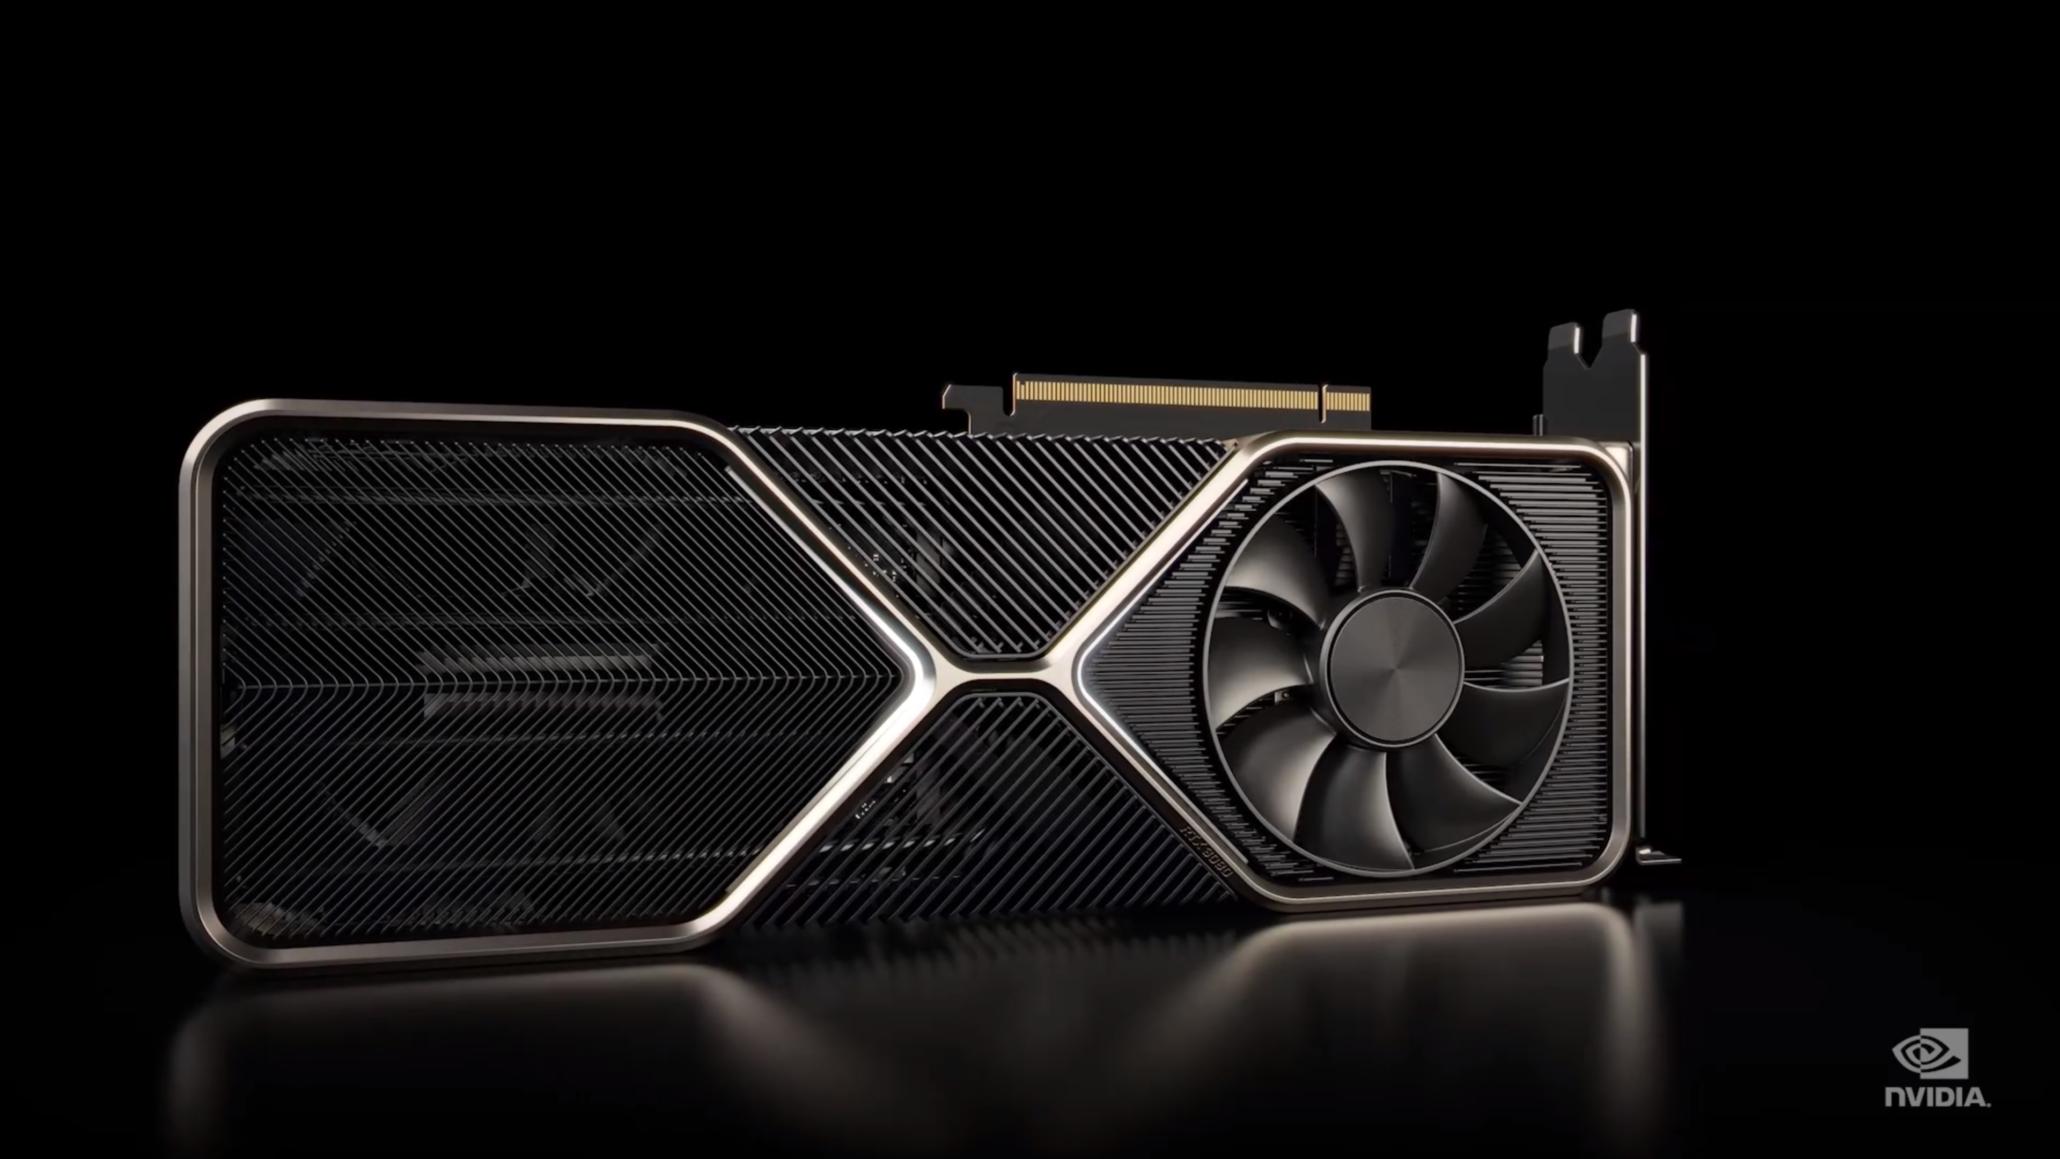 NVIDIA GeForce RTX 3080 SUPER